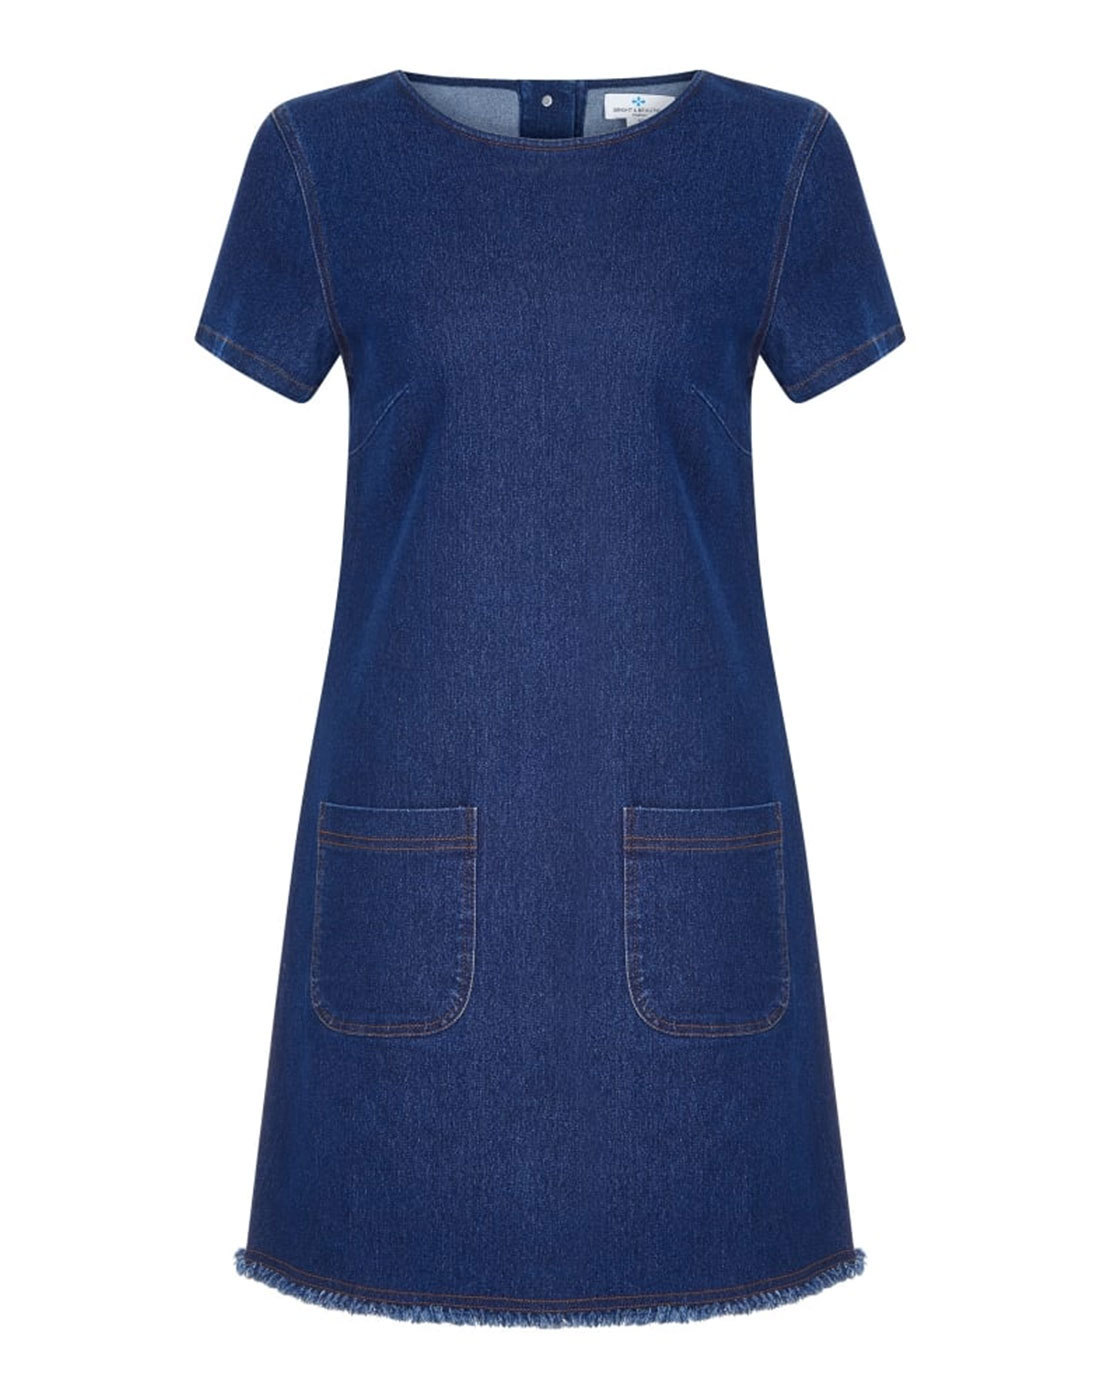 Ella BRIGHT & BEAUTIFUL Retro Denim Shift Dress